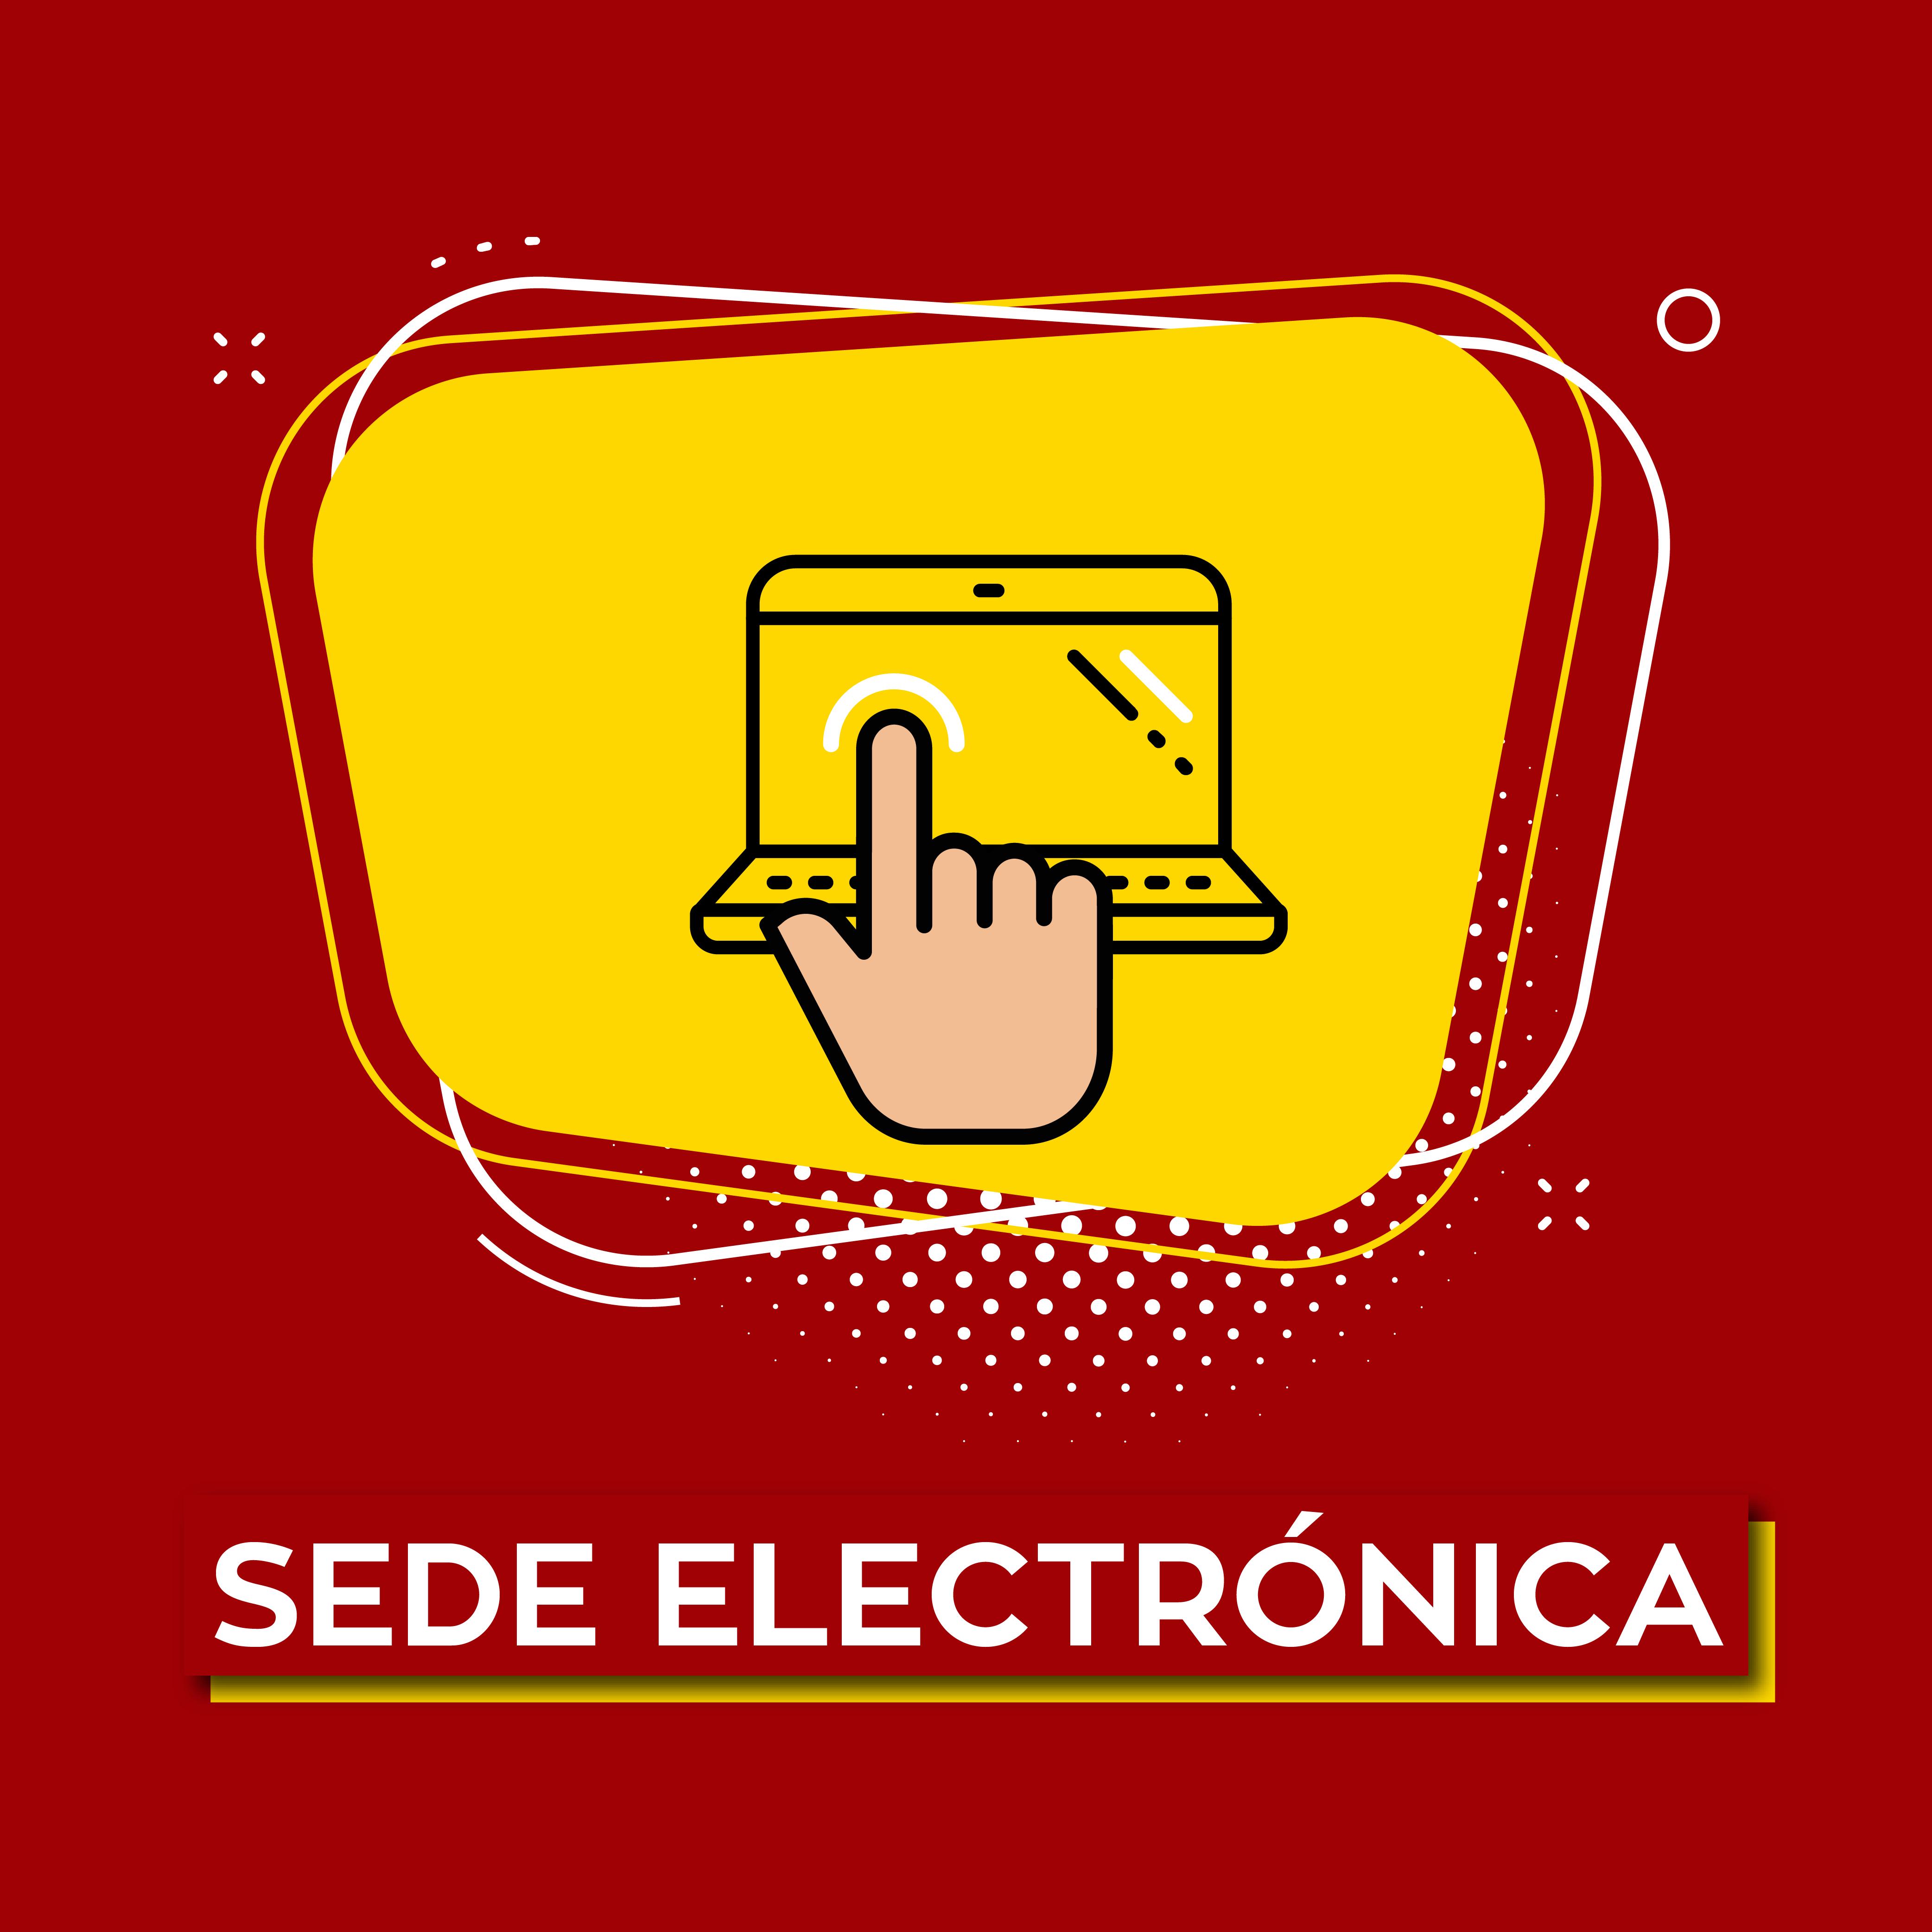 sede electronica santa elena de jamuz